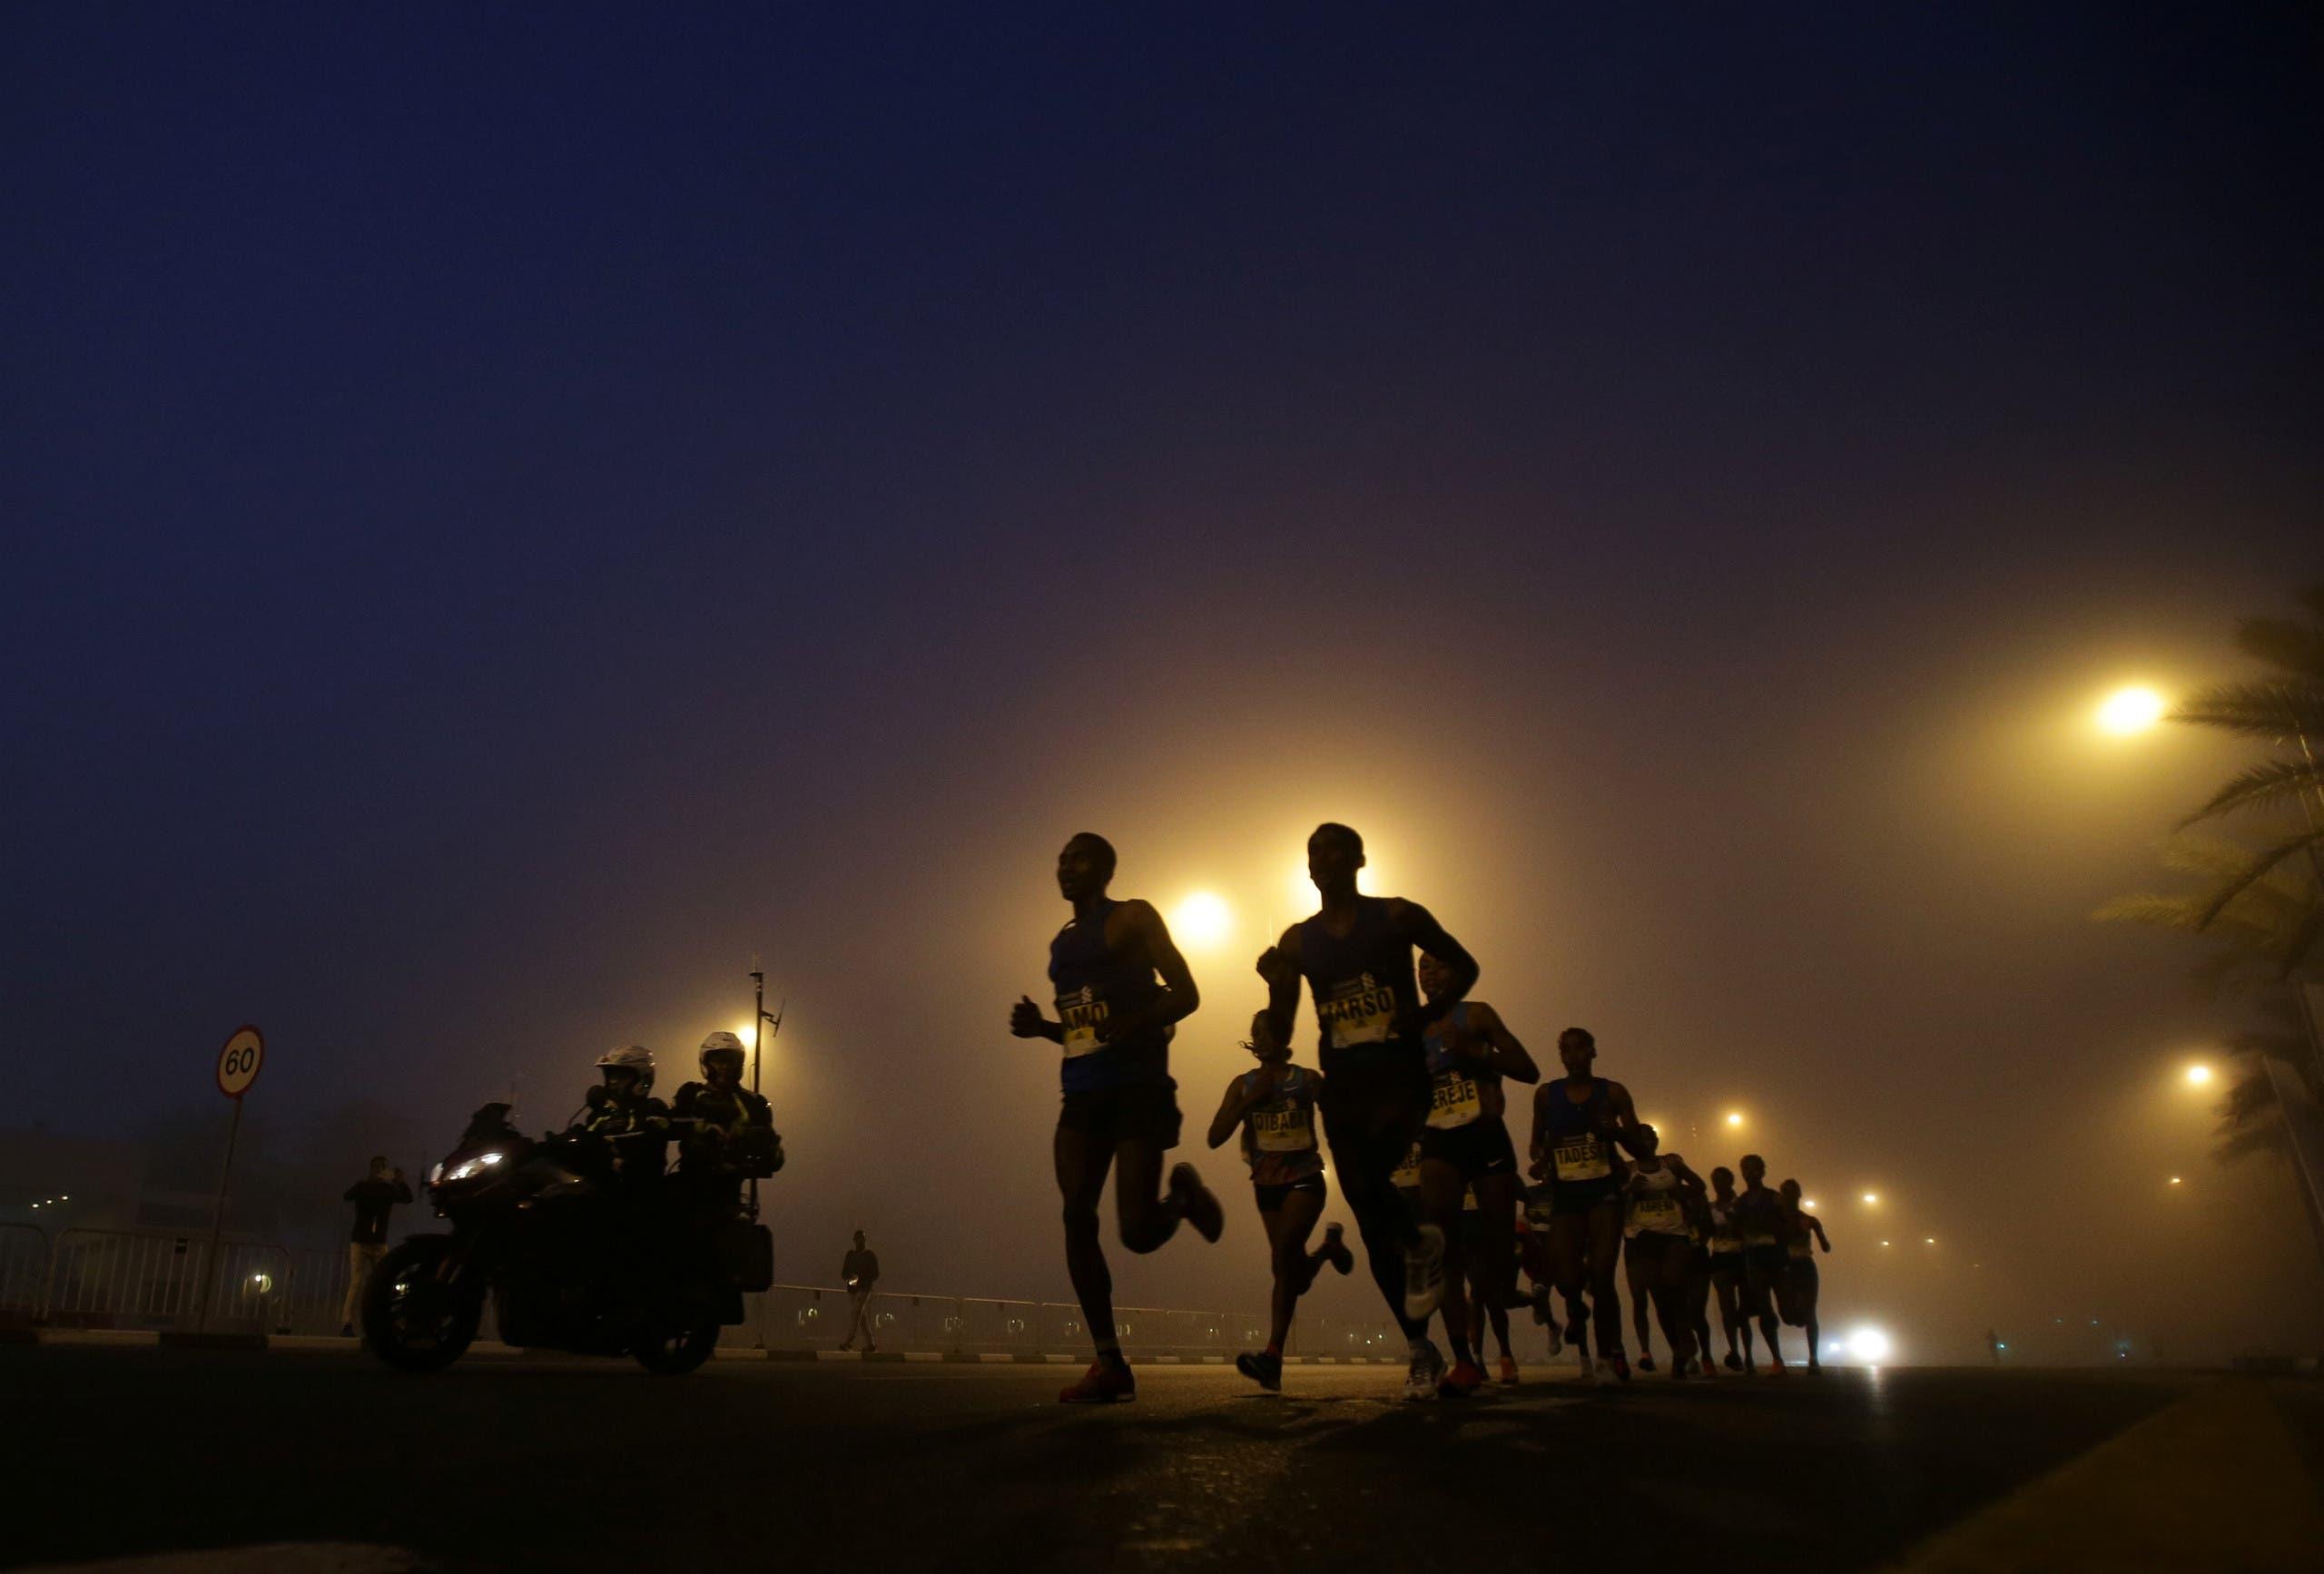 Athletes compete during the Dubai Marathon in Dubai, UAE January 26, 2018. REUTERS